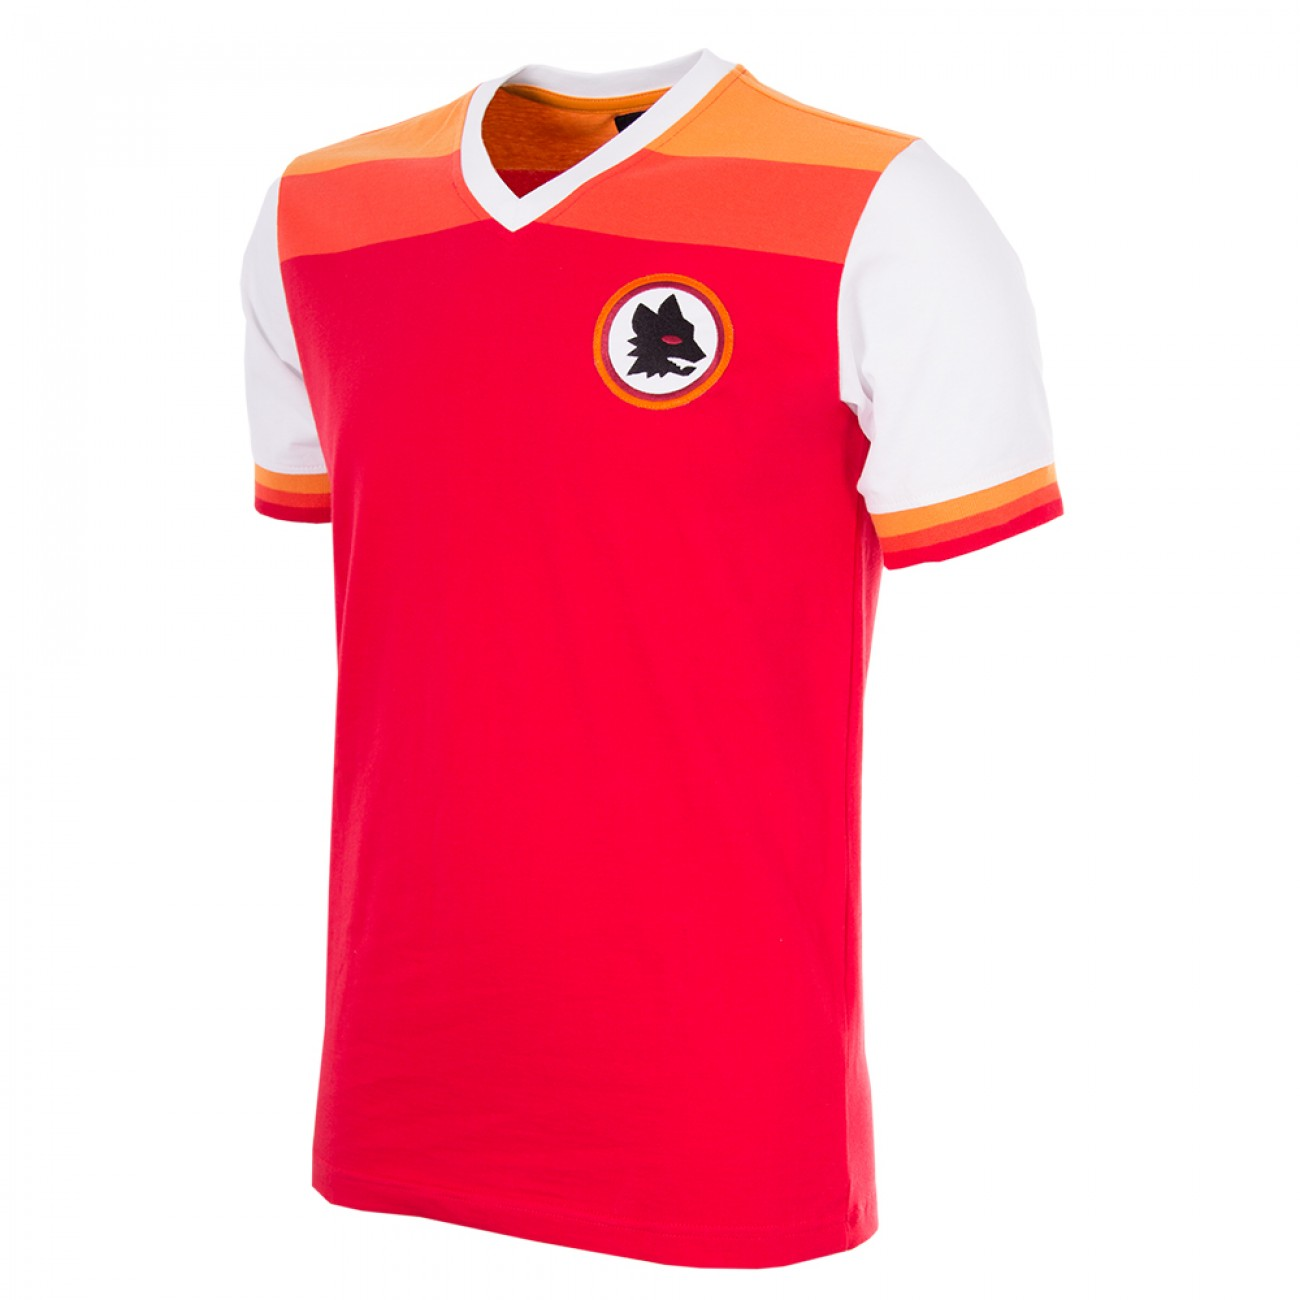 http://www.retrofootball.es/ropa-de-futbol/camiseta-as-roma-1979-80.html